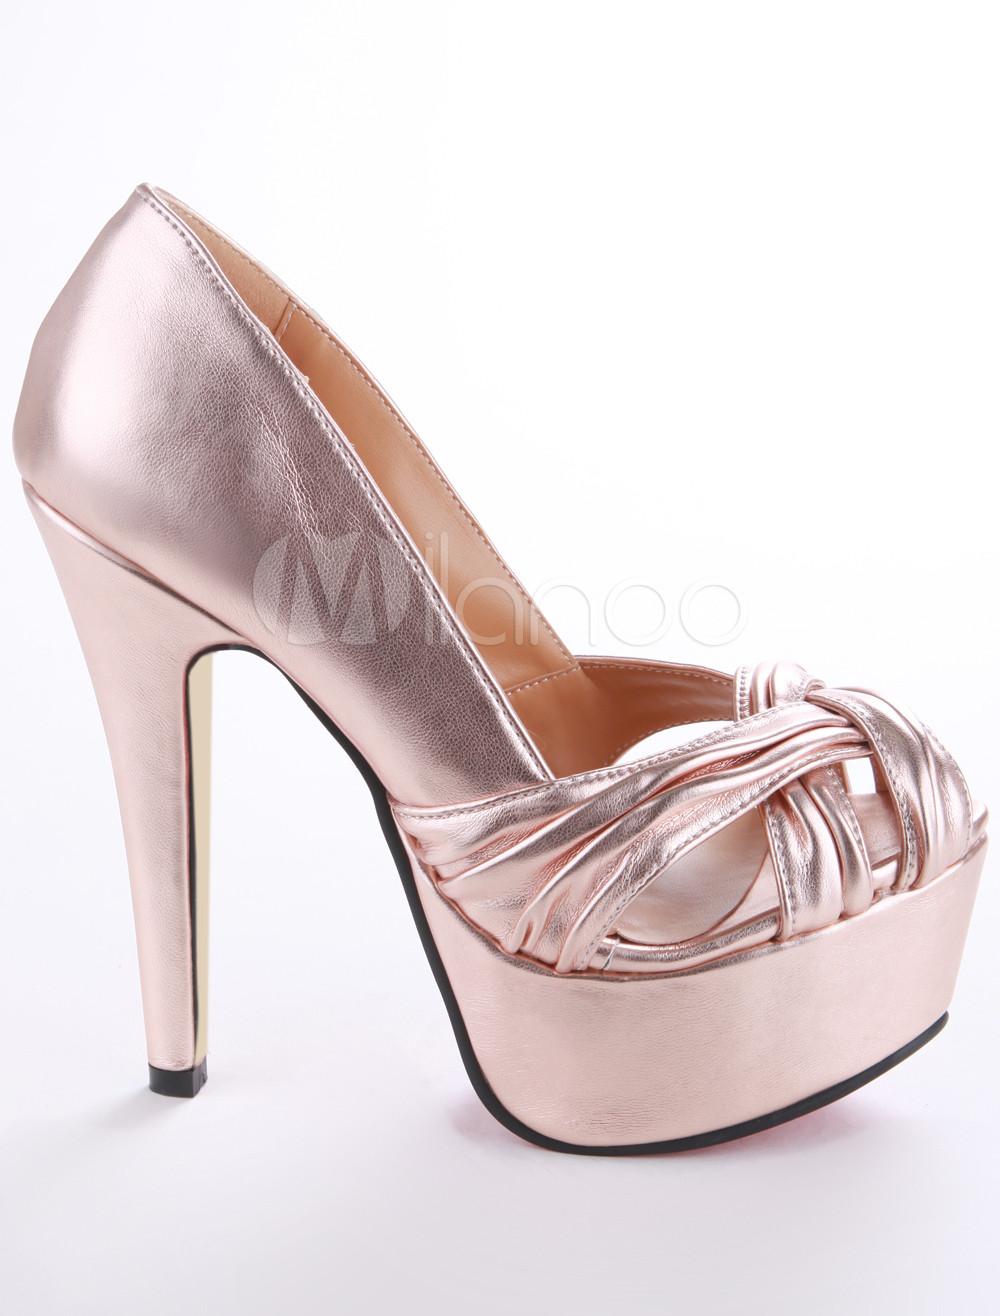 Criss Cross Ankle Strap Sandals - cuteclothesforteens